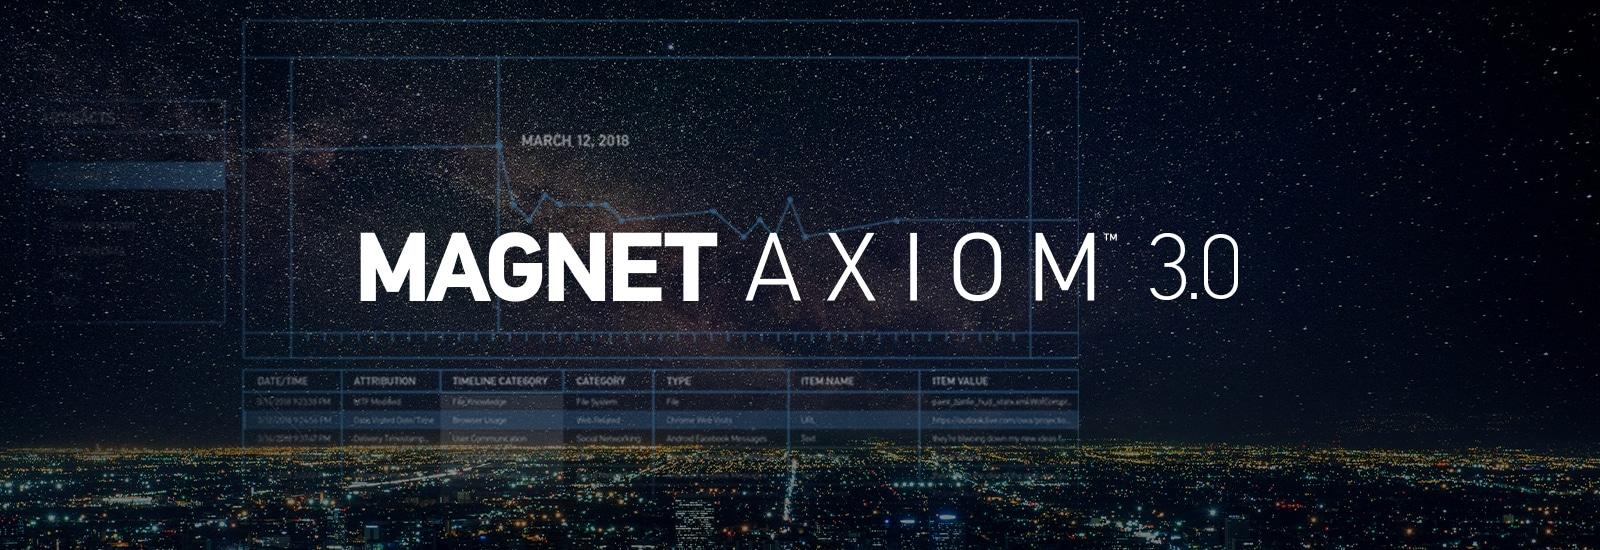 Magnet AXIOM 3.0